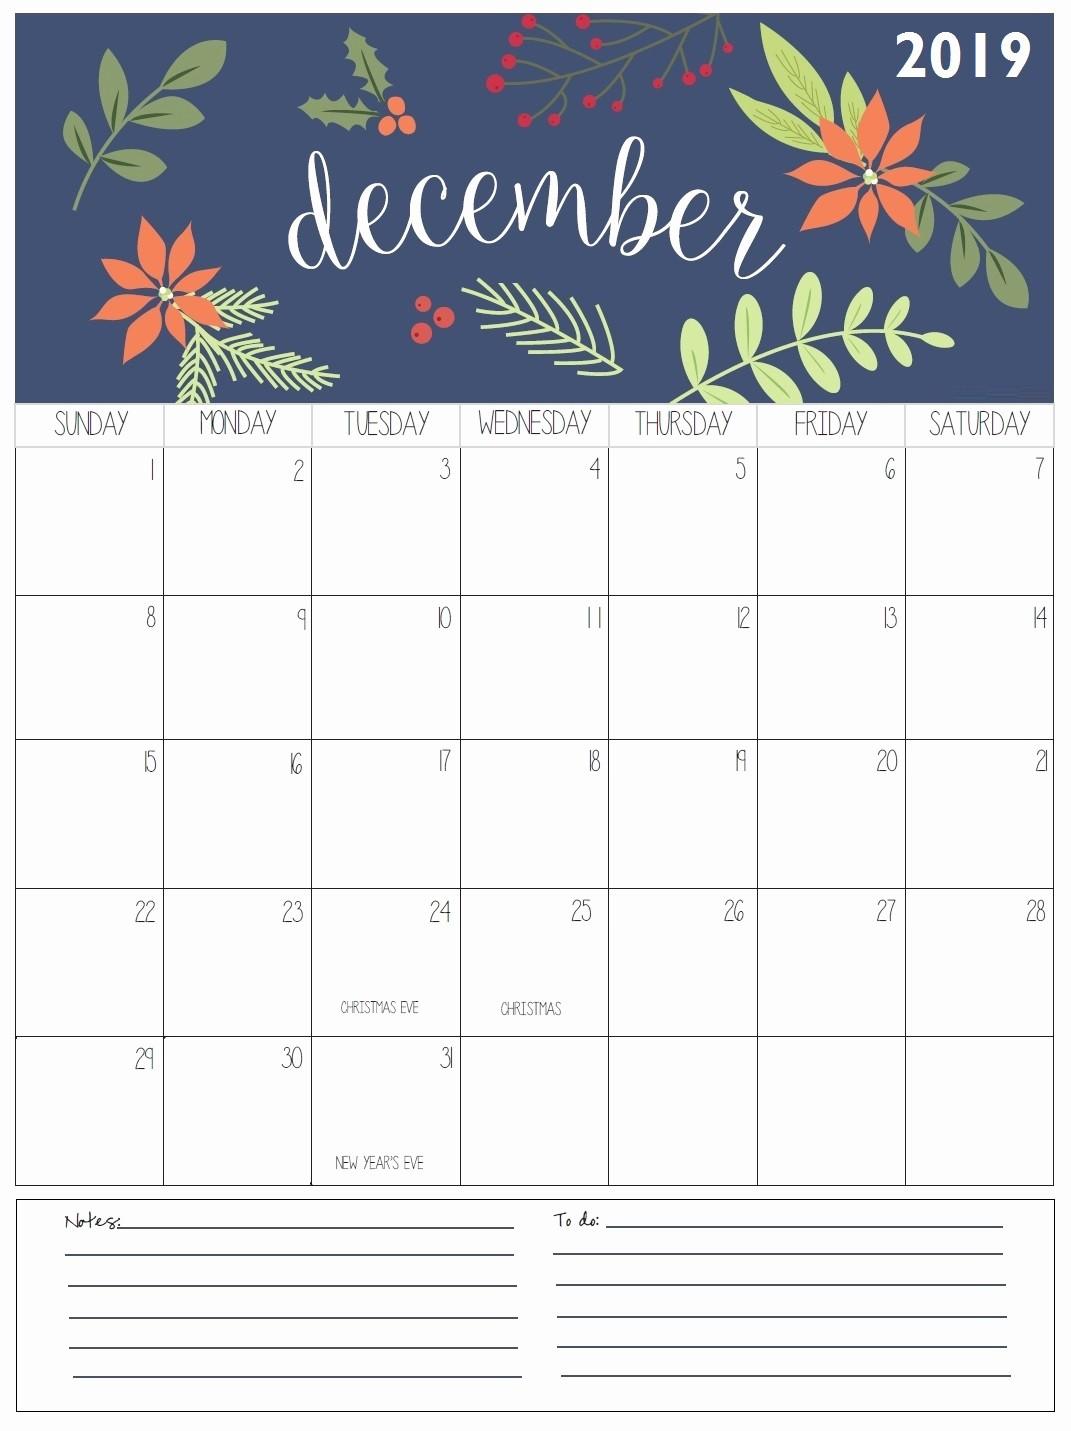 Show Me A Monthly Calendar Elegant Monthly Printable Calendar 2019